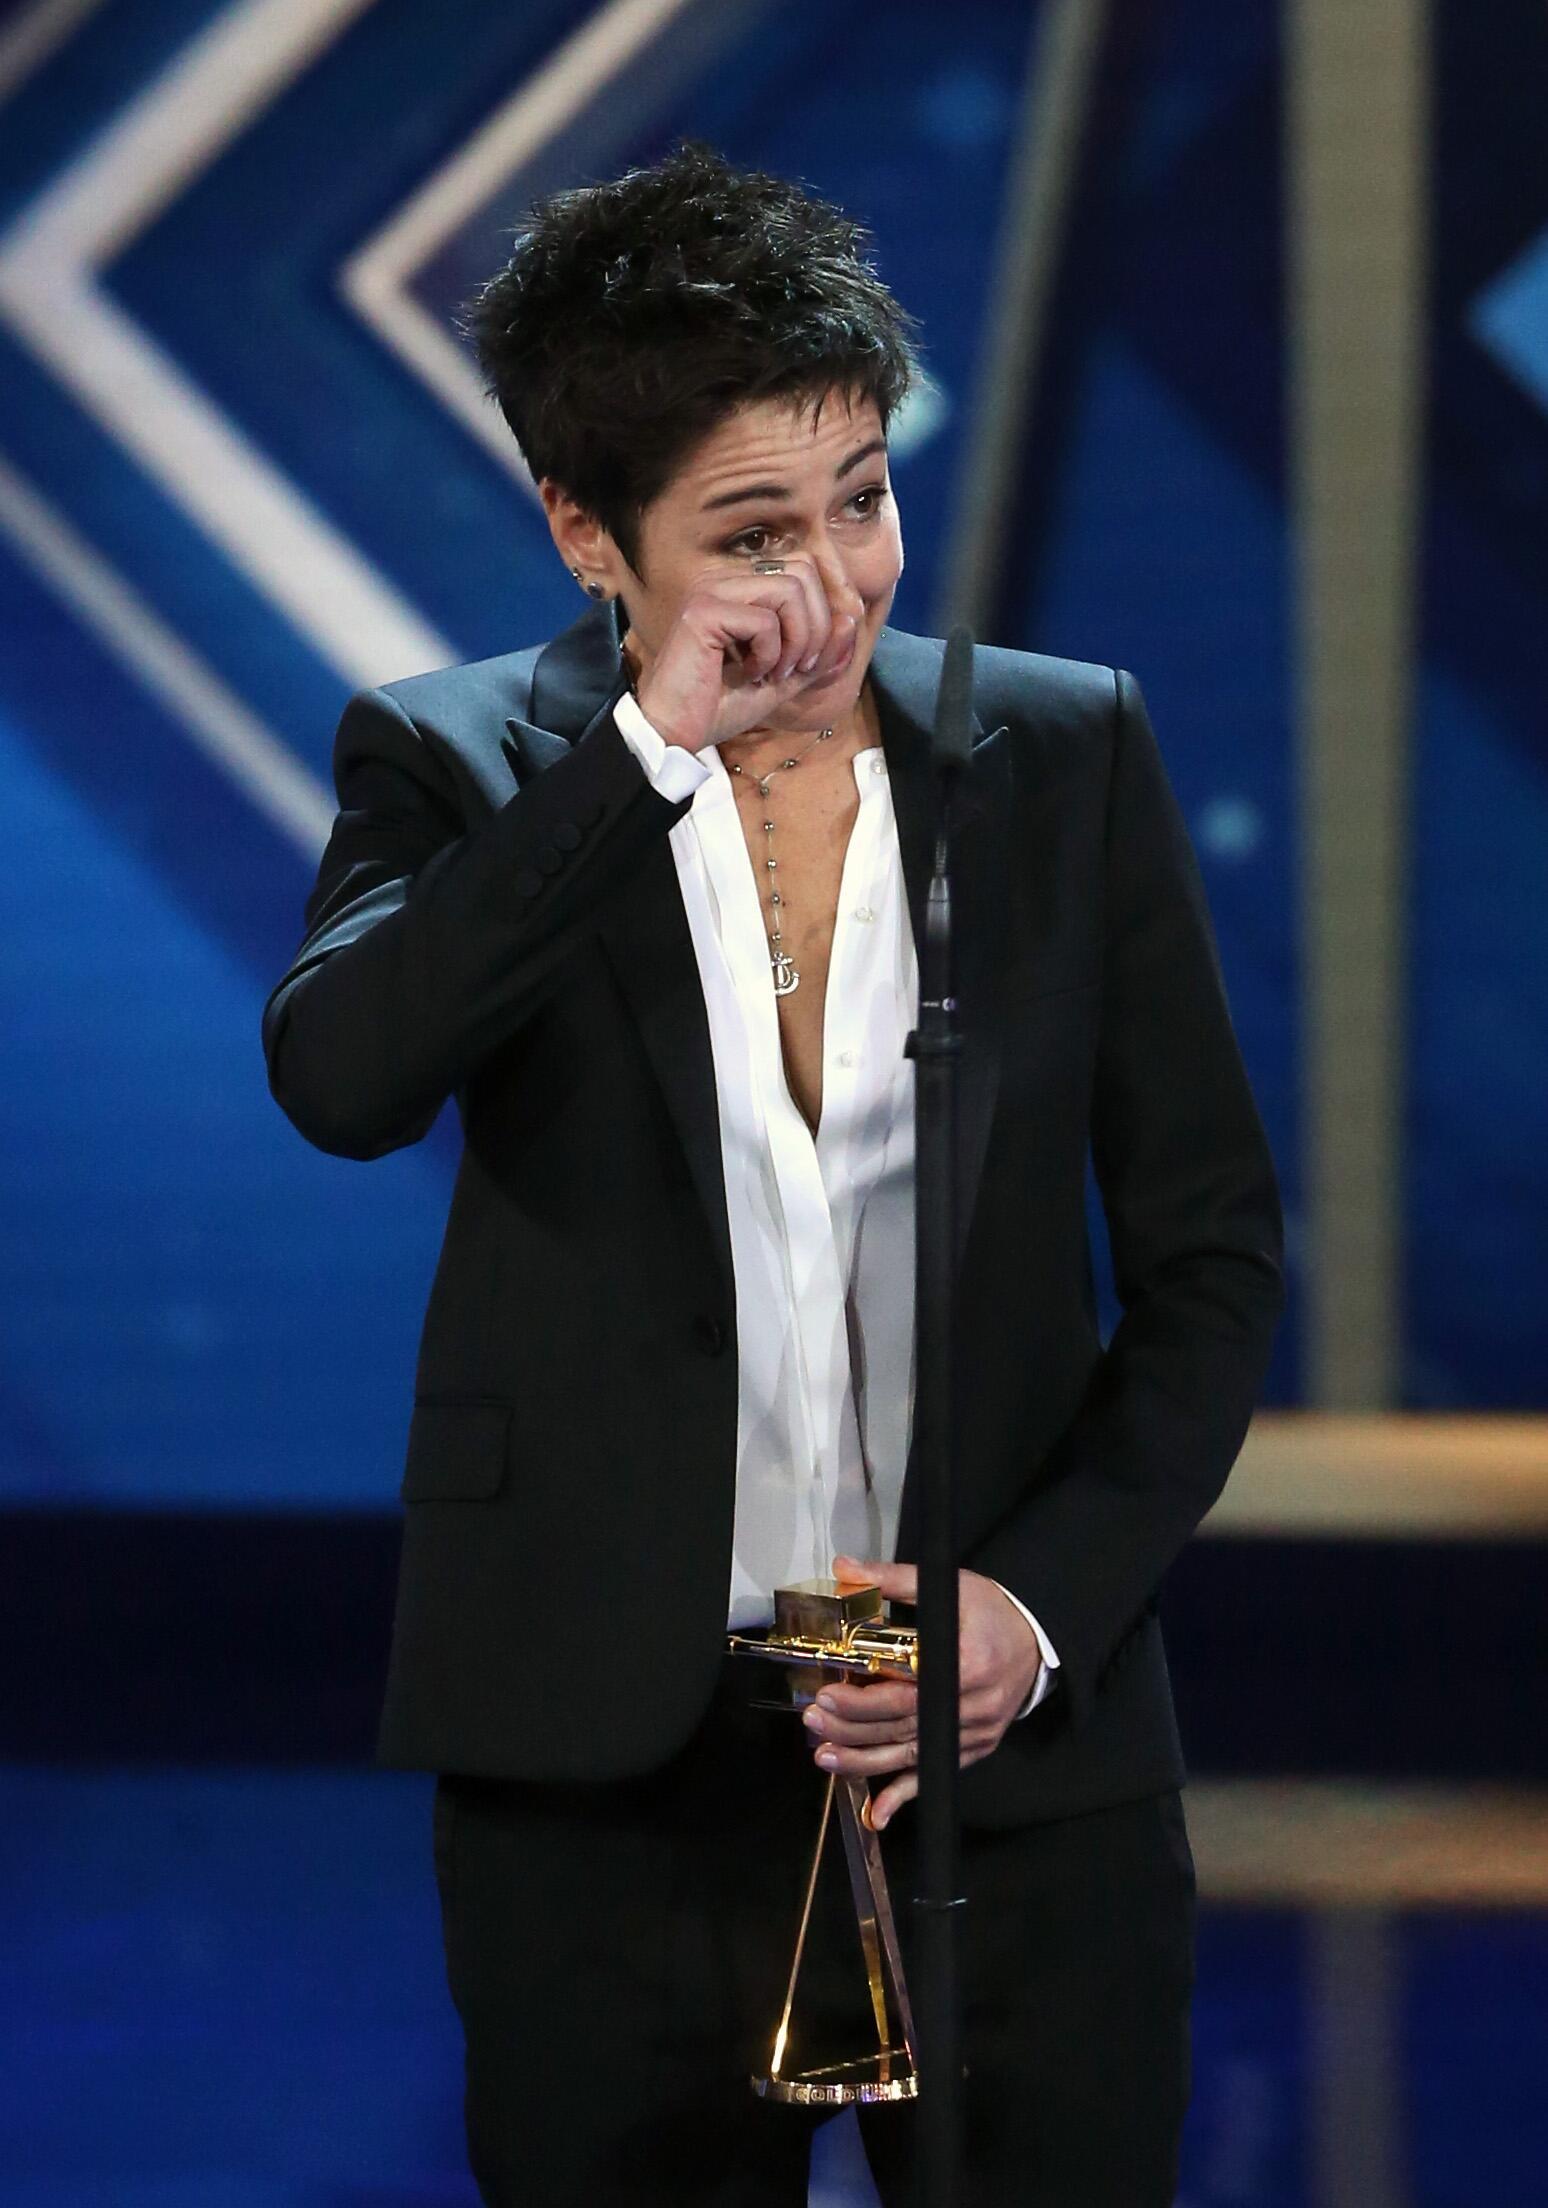 Goldene Kamera Für Tv Journalistin Dunja Hayali Webde